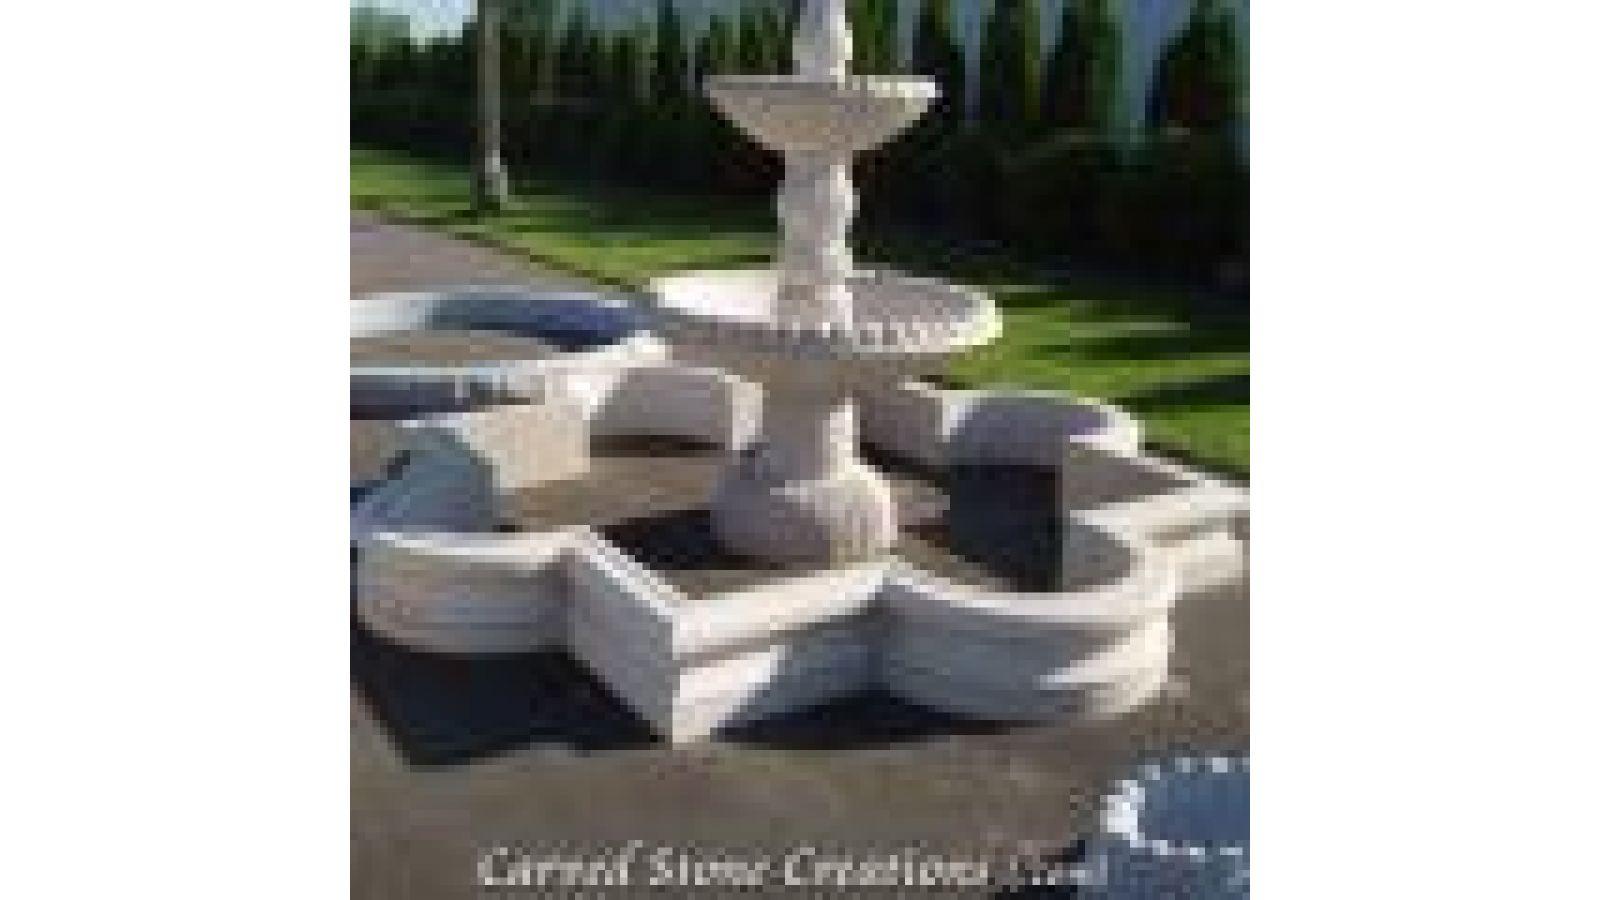 SUR-D120H12-Q01, Lowered Quartrefoil Granite Fountain Surround